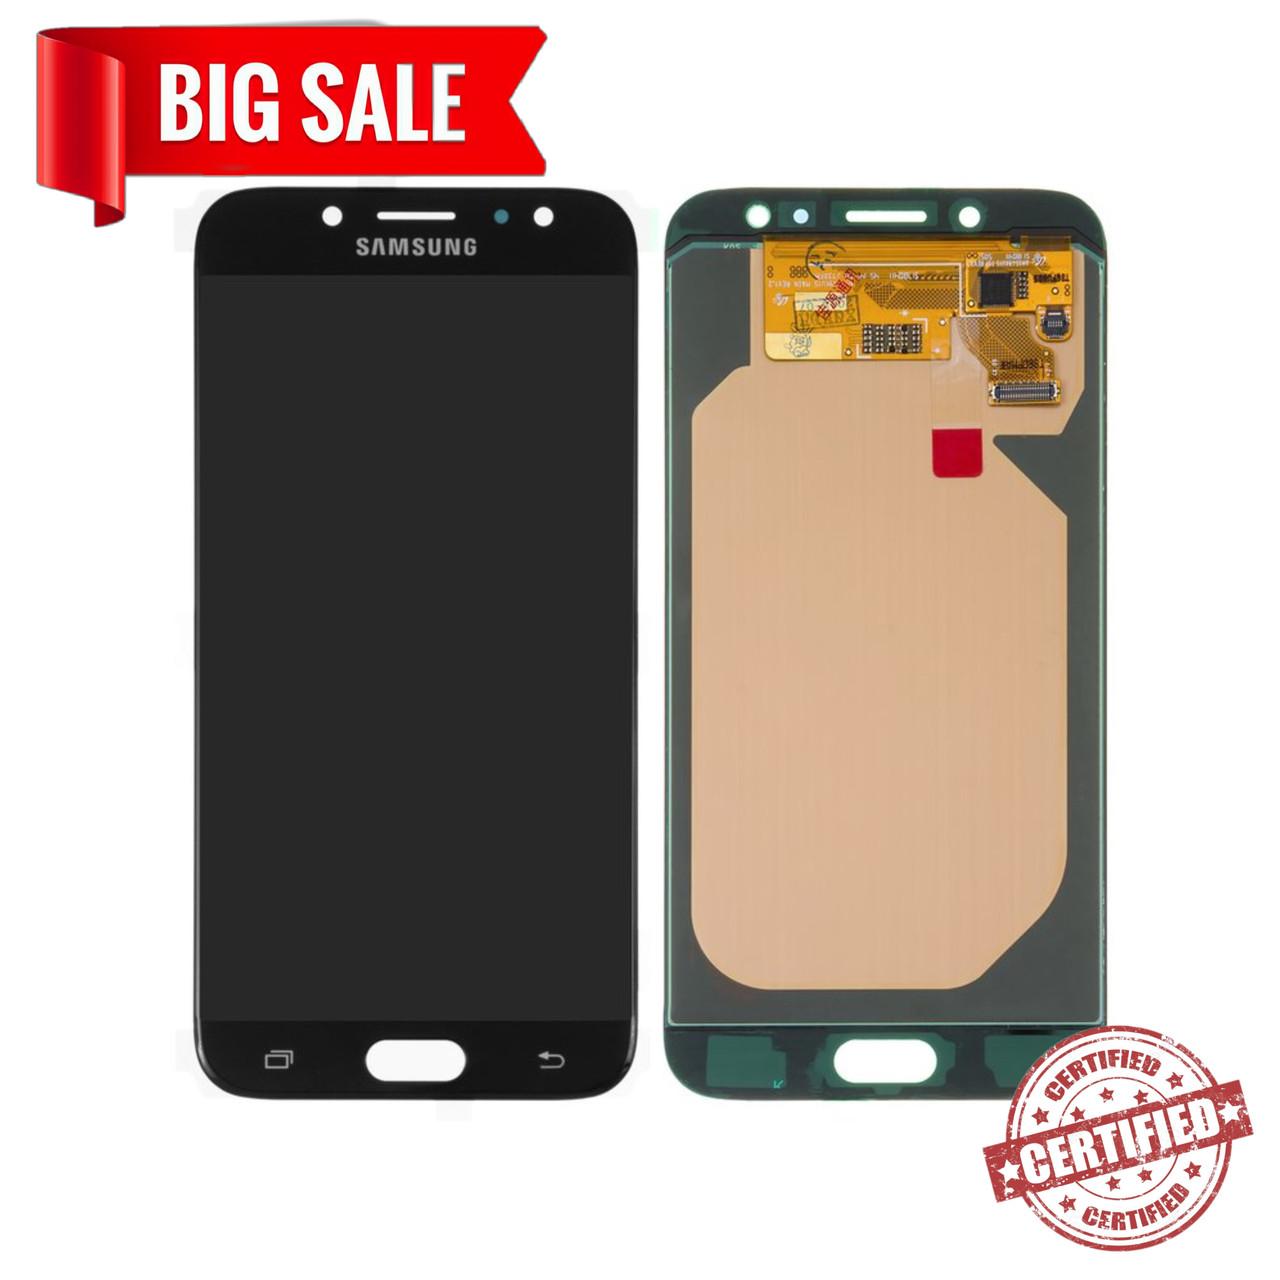 Модуль (сенсор+дисплей) Samsung J730F, J730GM/DS, J730G/DS, J730G/DS, J730FM/DS Galaxy J7 (2017) OLED чорний